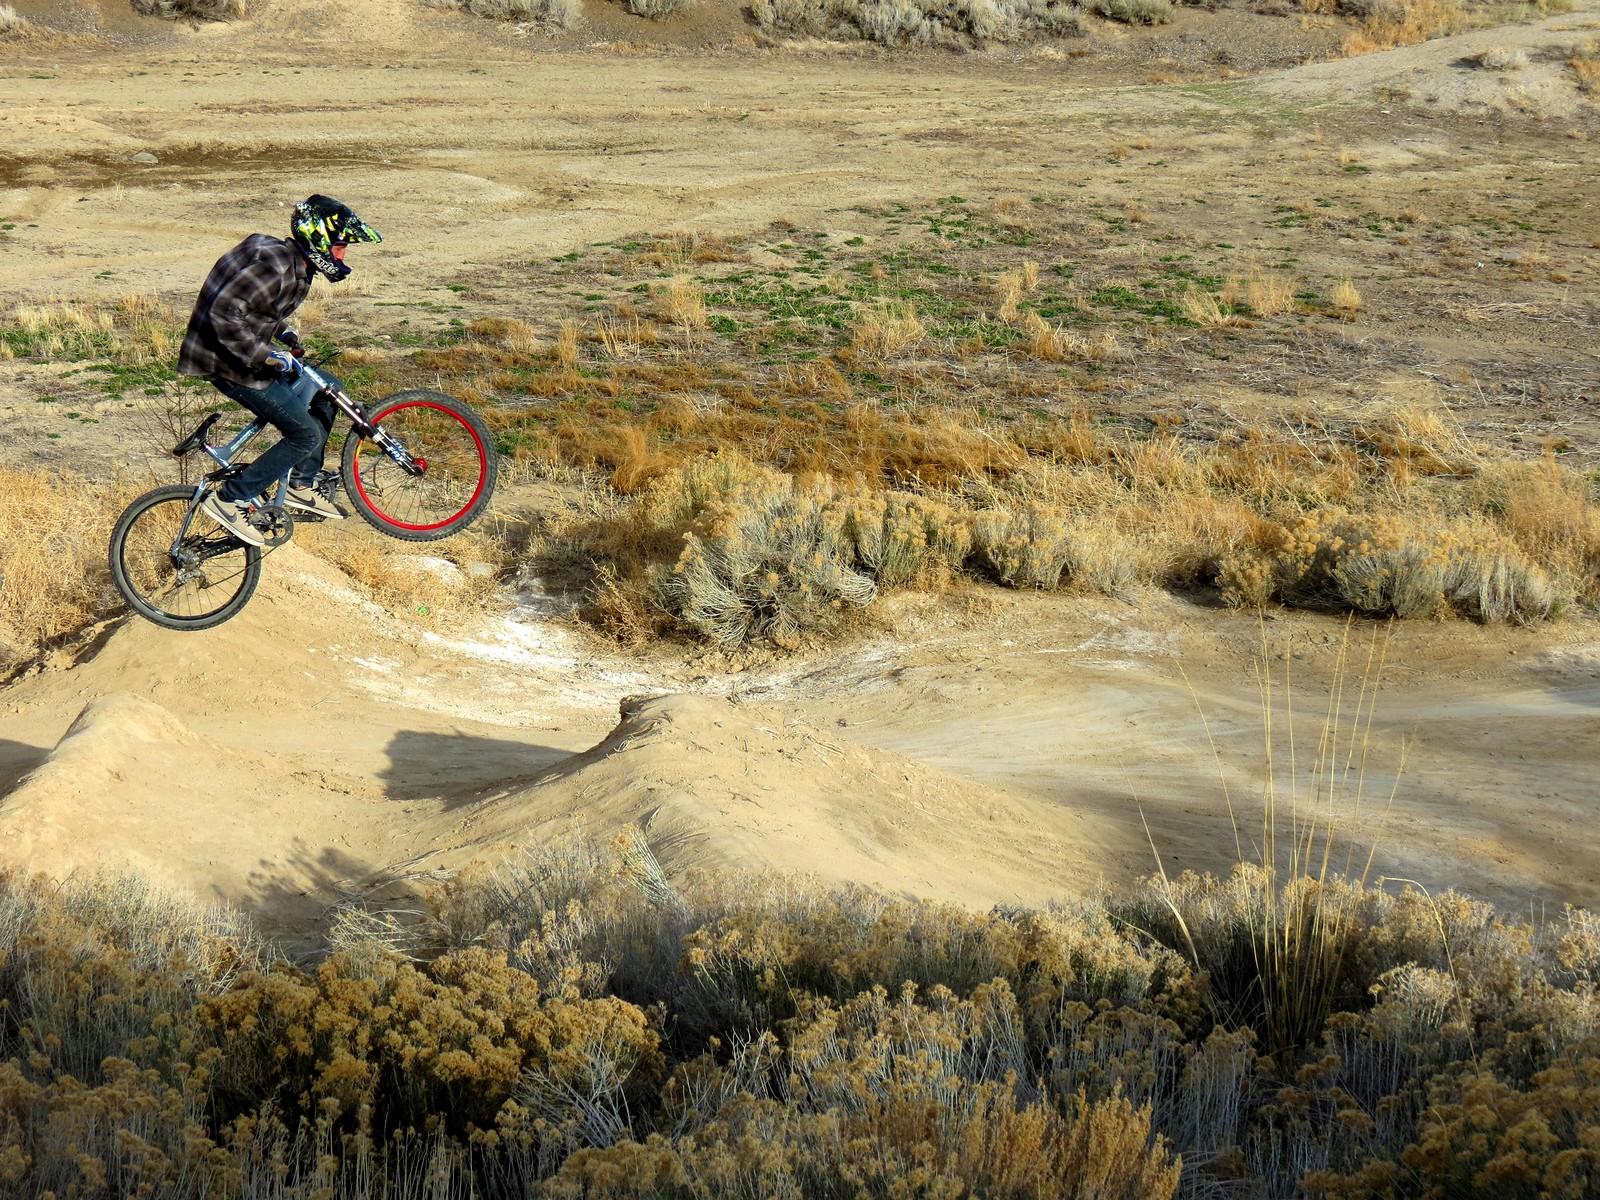 McQ - Moosey - Mountain Biking Pictures - Vital MTB